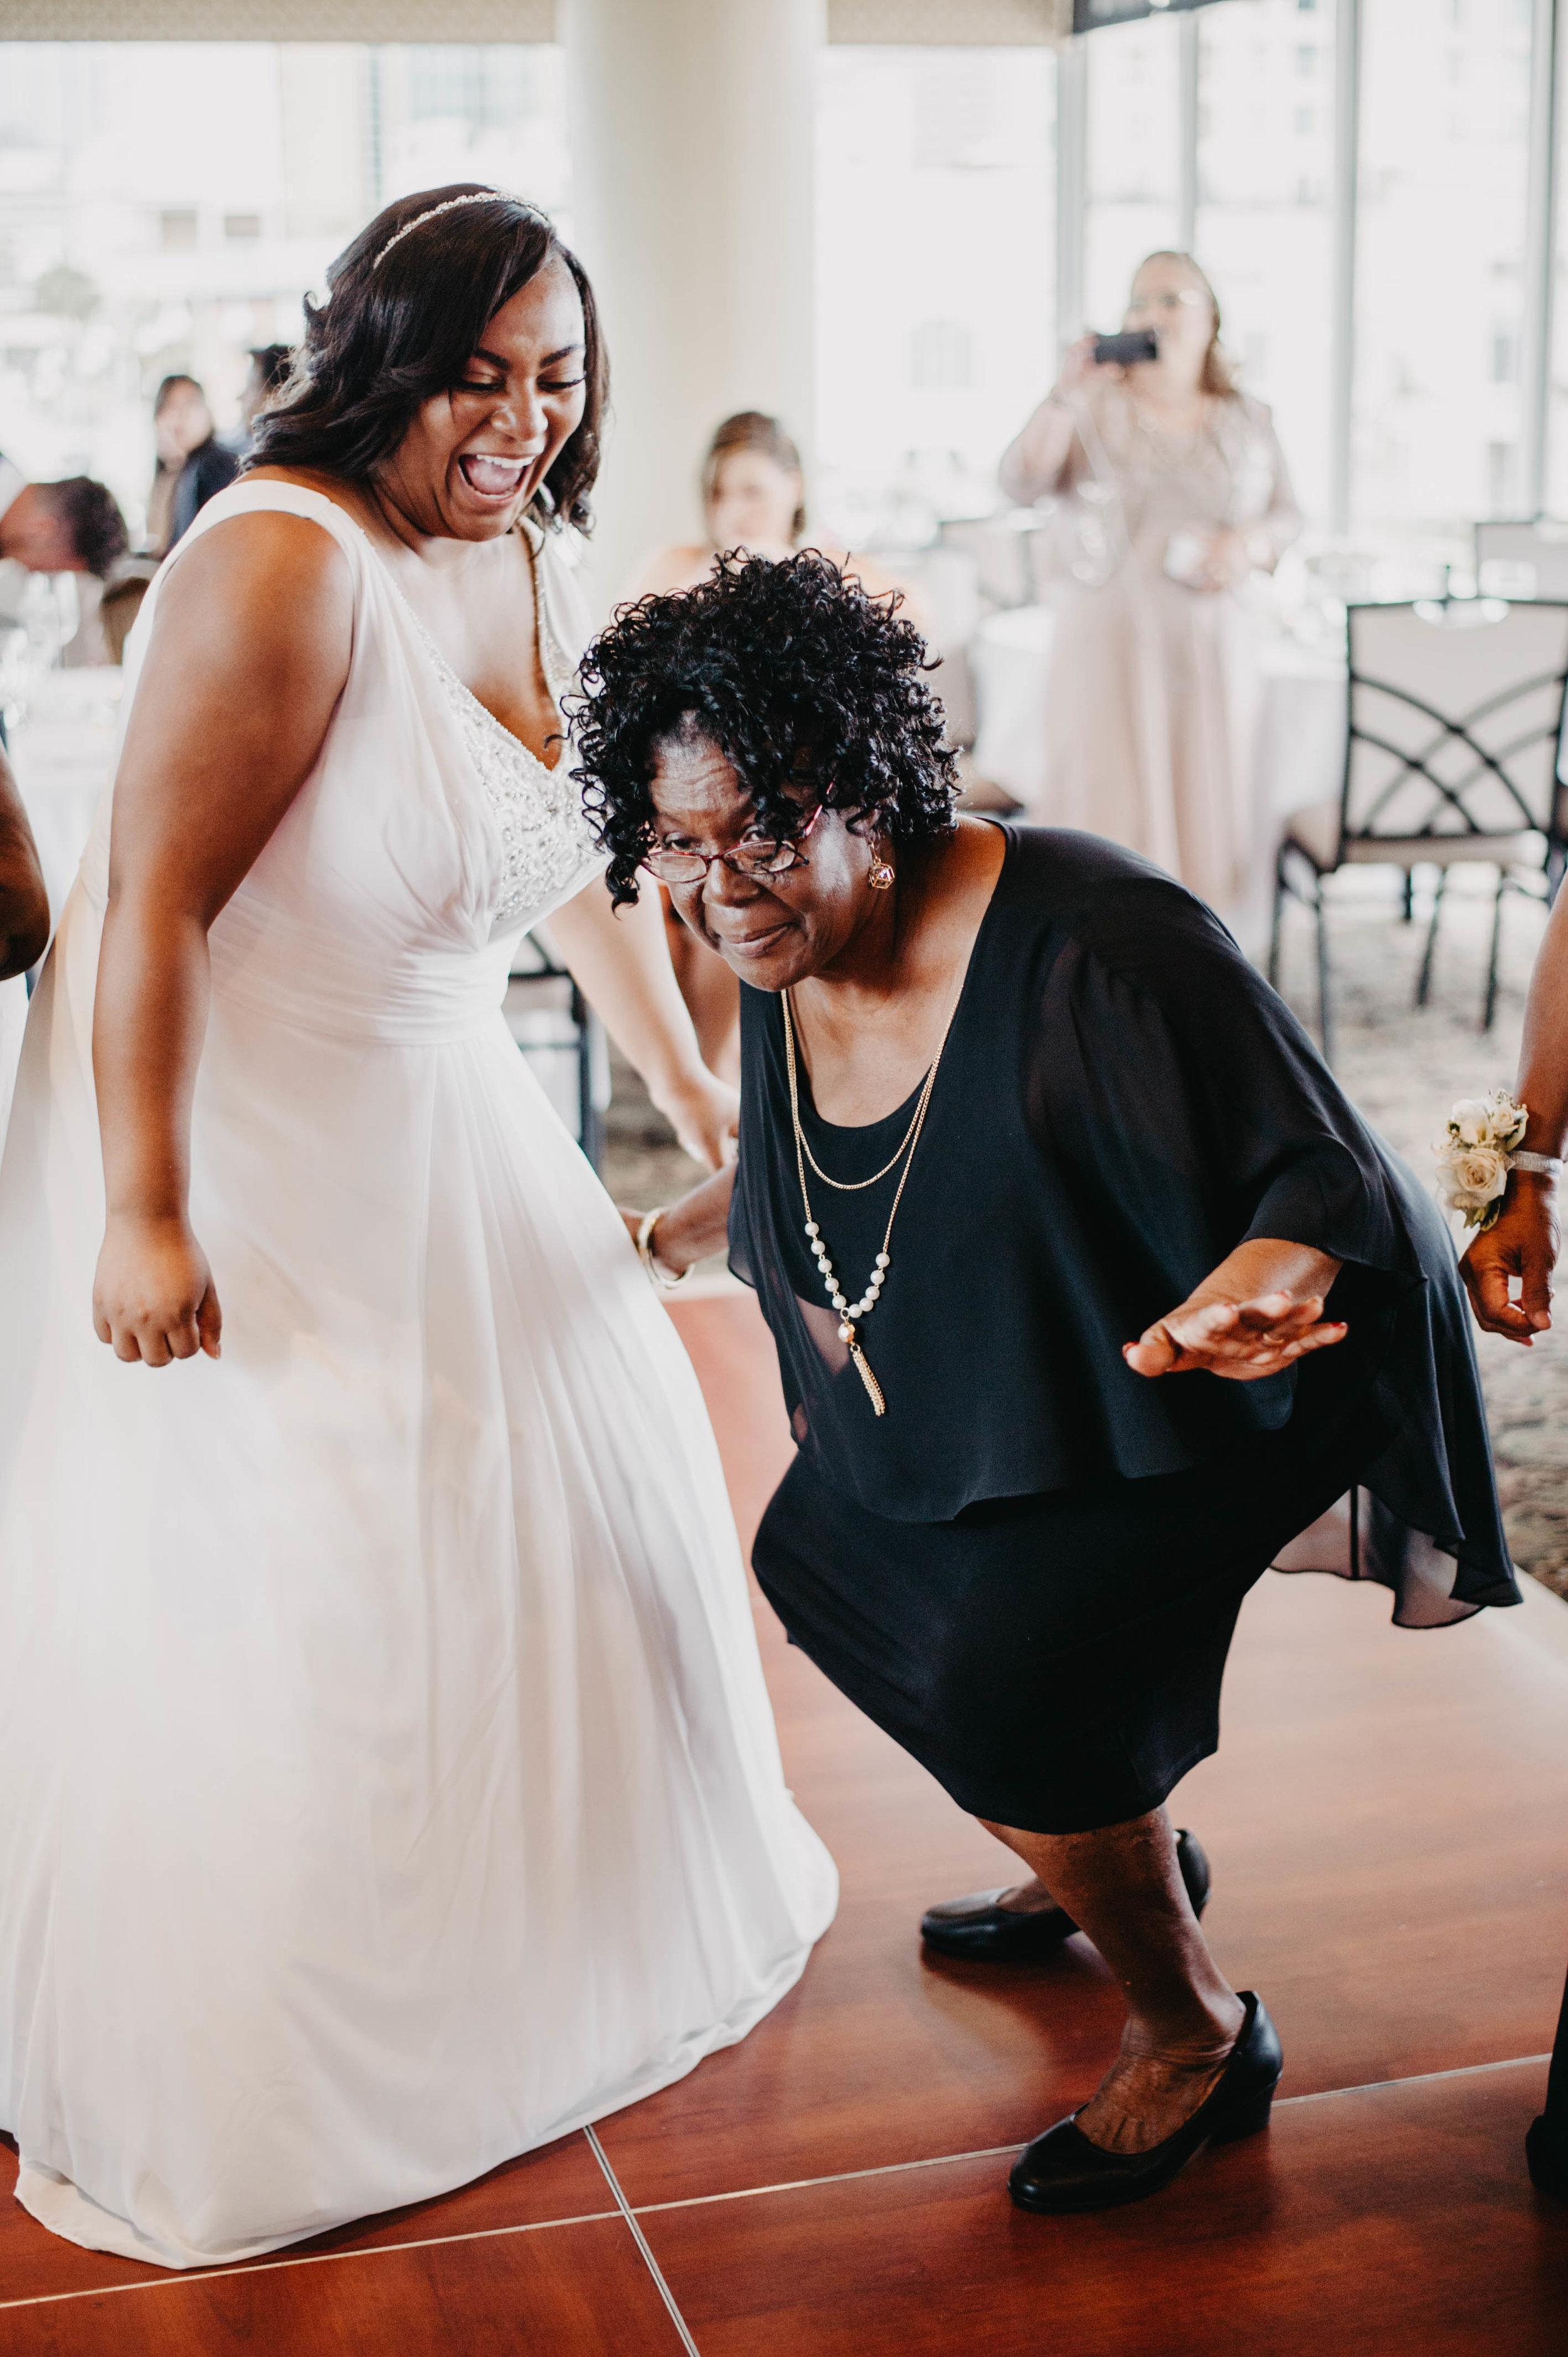 McNeile_Photography_Wedding_Tampa64.jpg